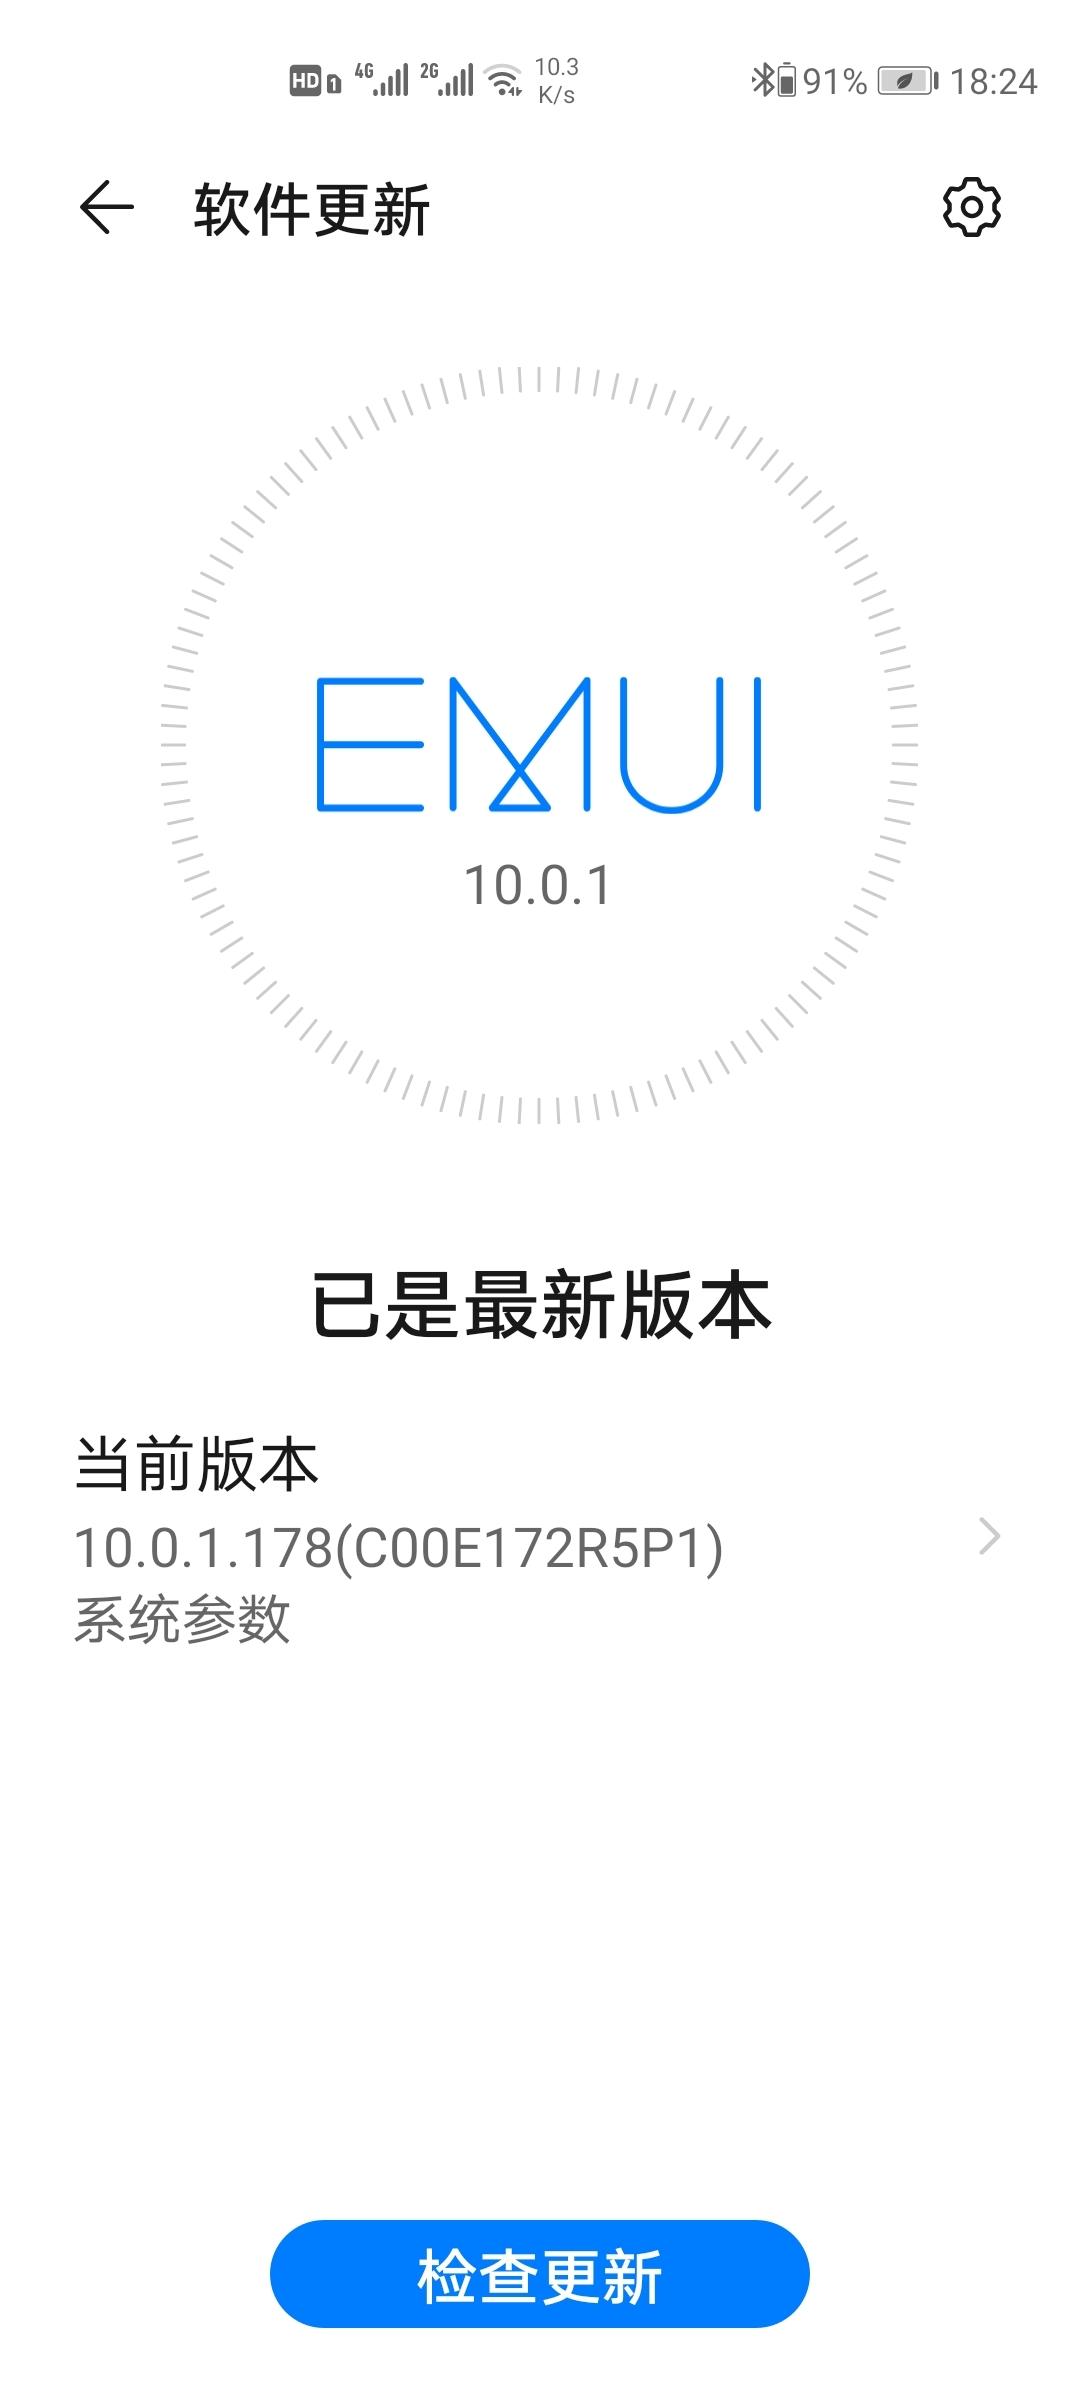 Screenshot_20200520_182417_com.huawei.android.hwouc.jpg